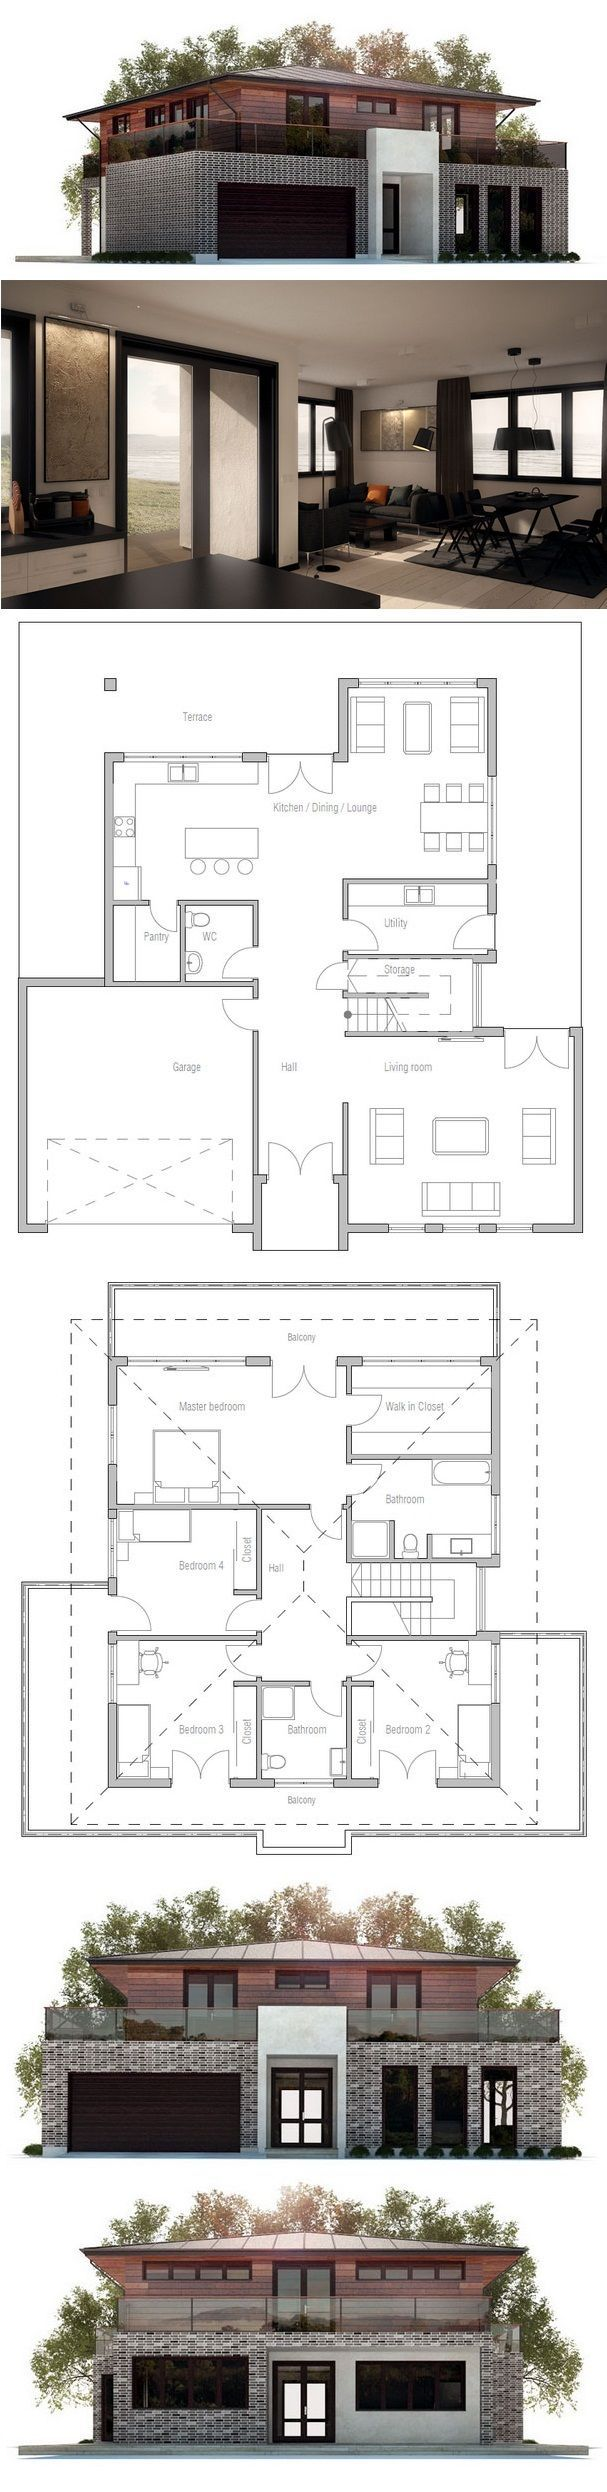 Best 25 Beautiful House Plans Ideas On Pinterest House